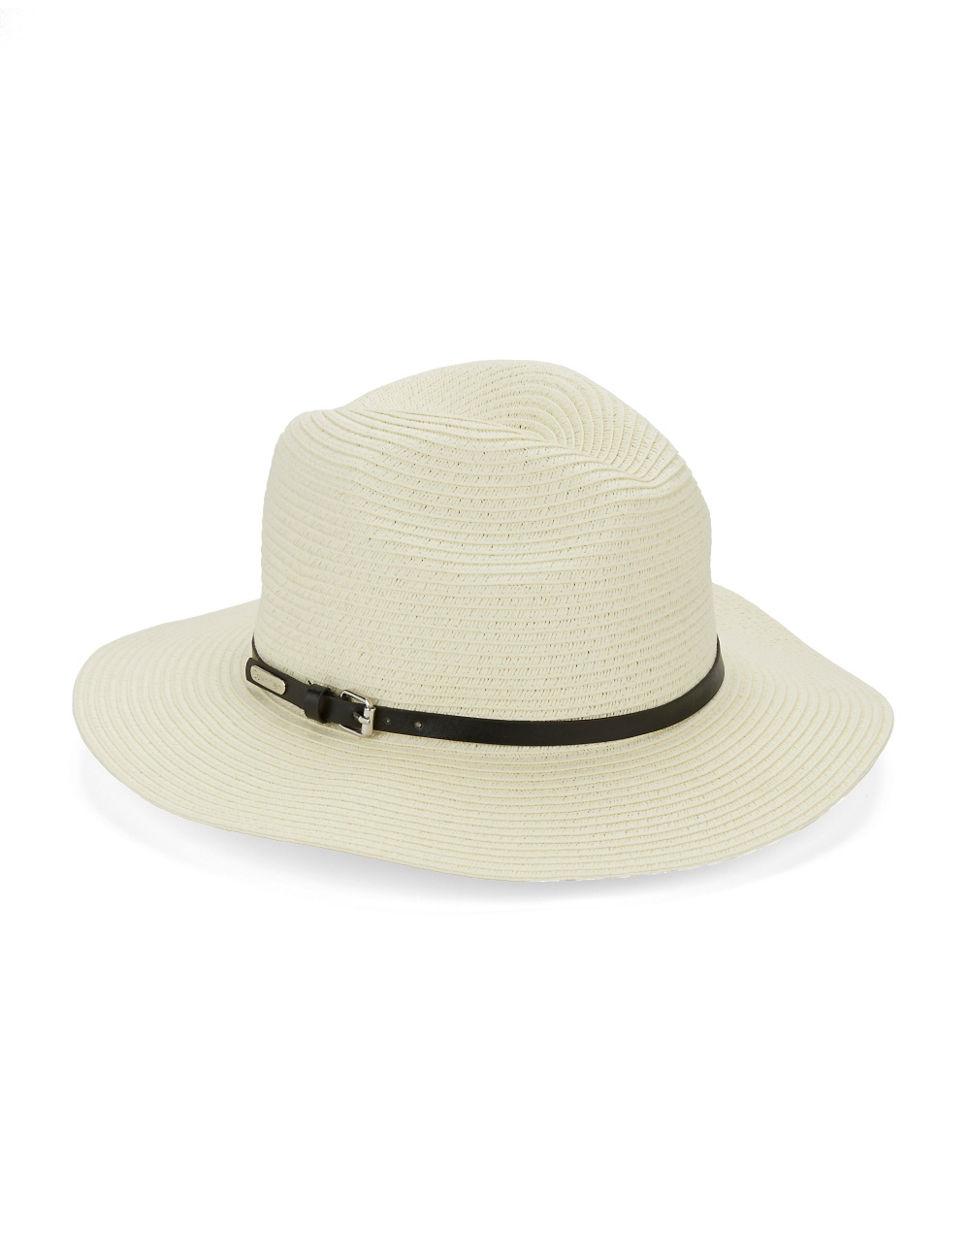 calvin klein woven panama hat in white lyst